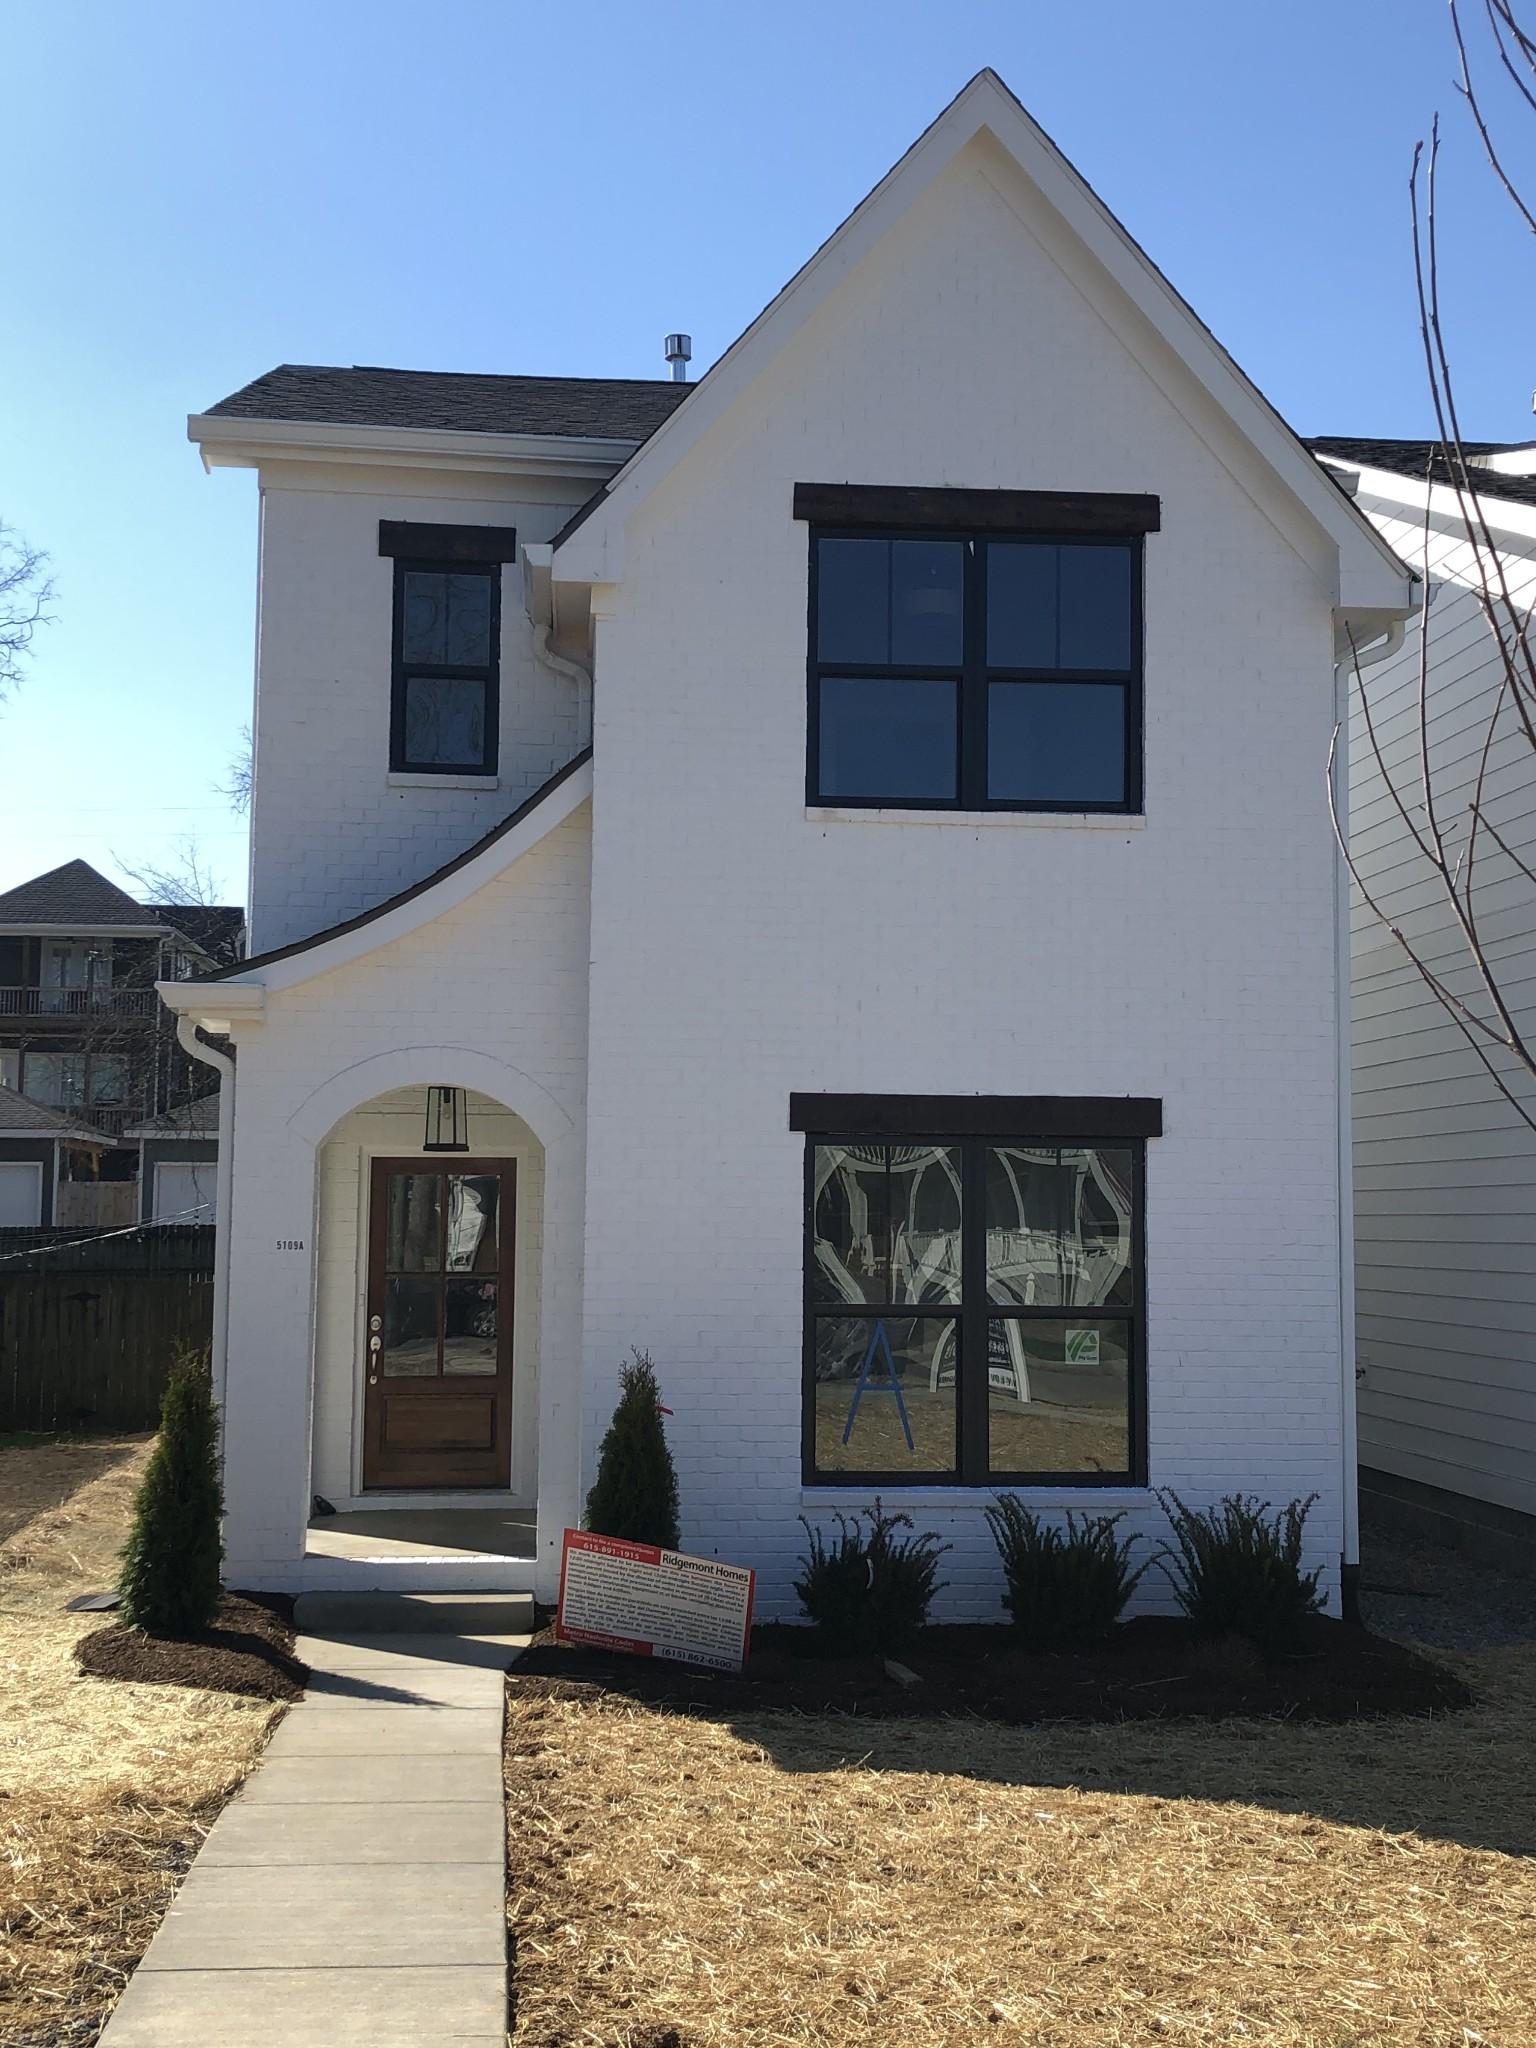 5109A Illinois Ave, Nashville, TN 37209 - Nashville, TN real estate listing